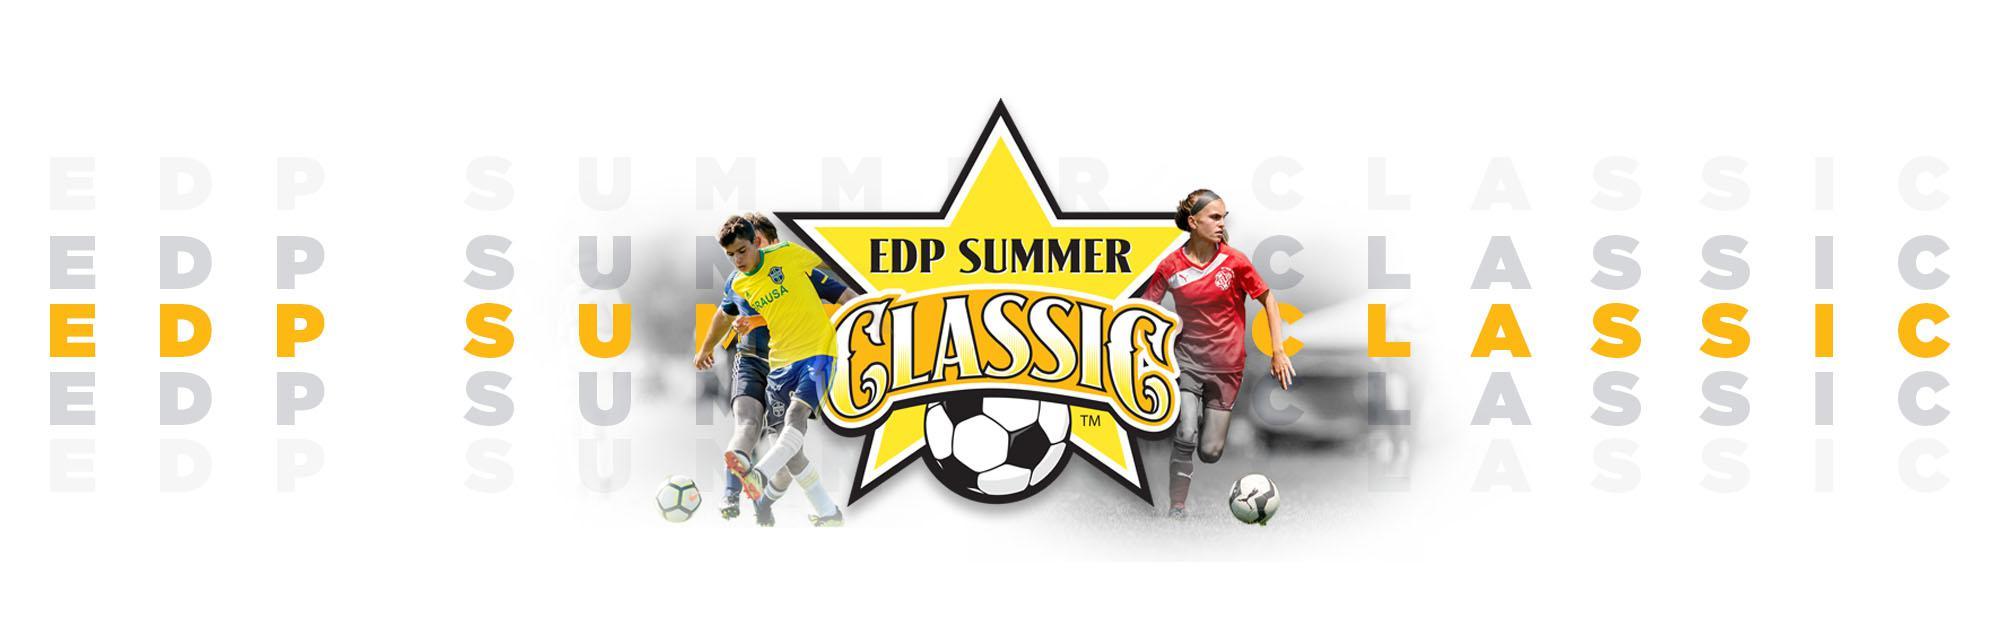 EDP Summer Classic